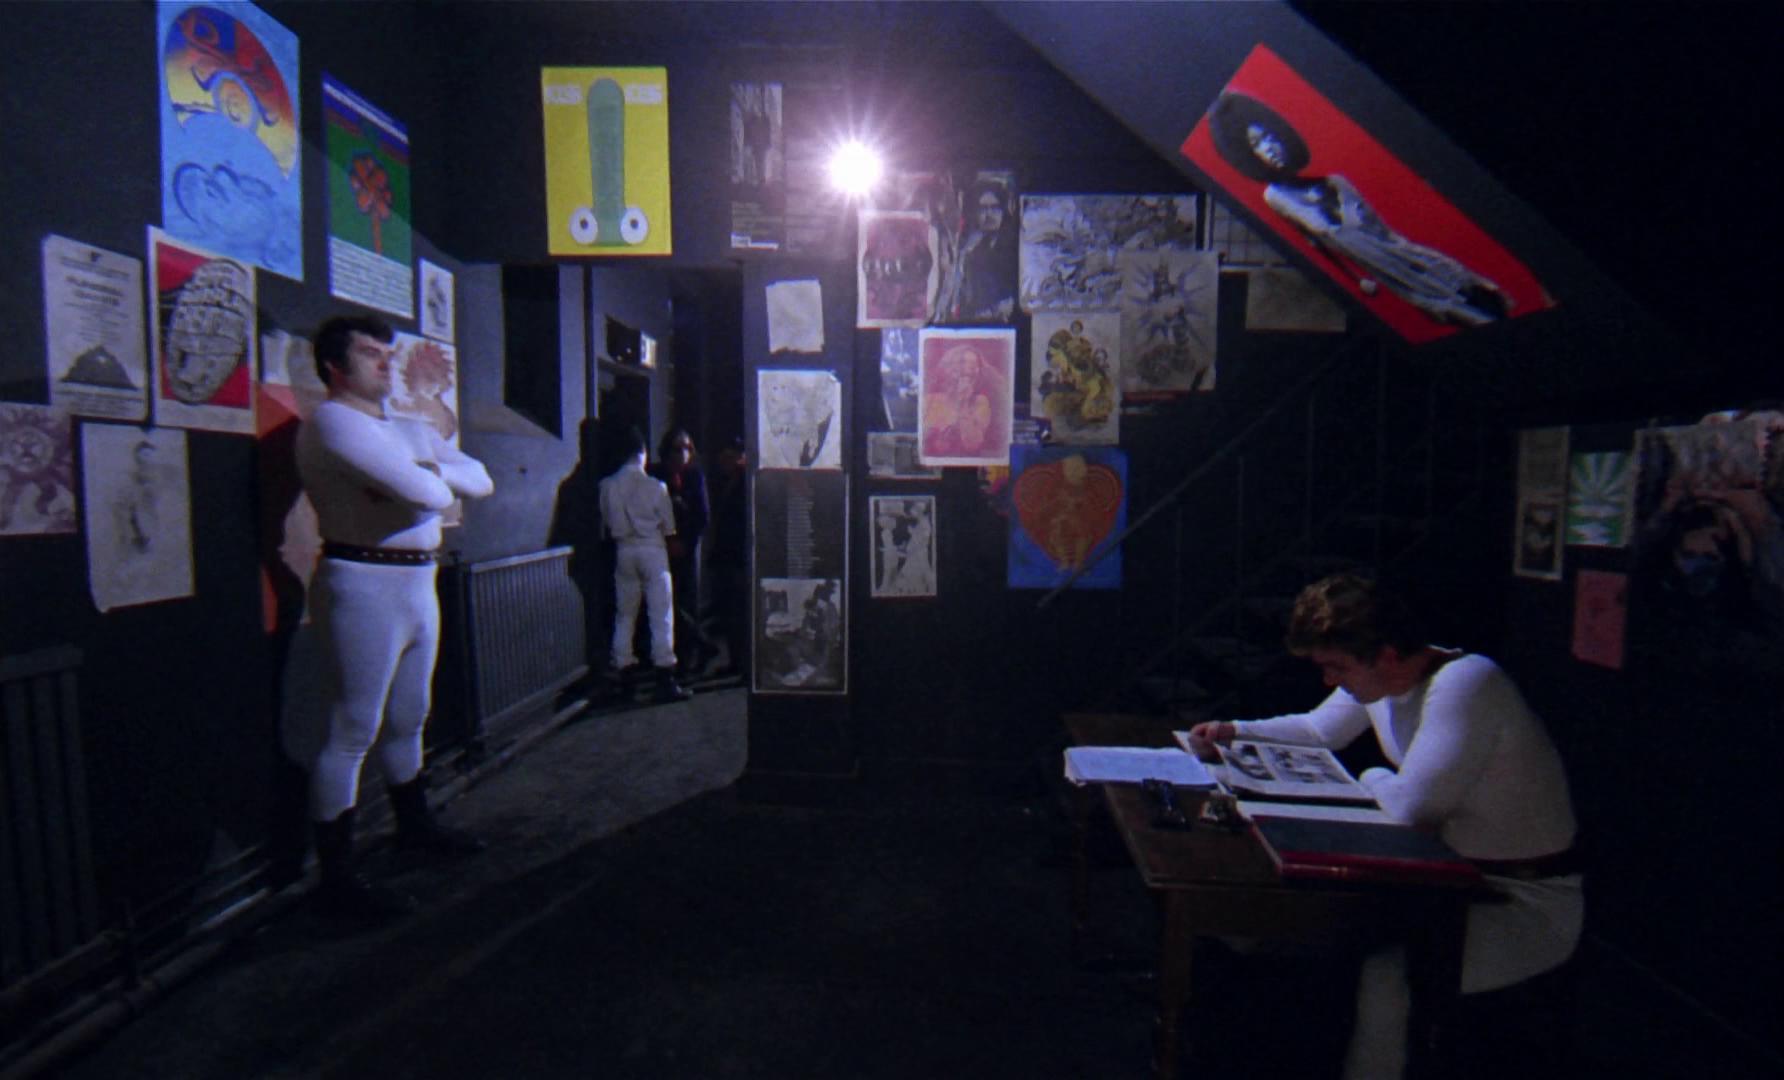 Moviery.com - Download the Movie A Clockwork Orange Online